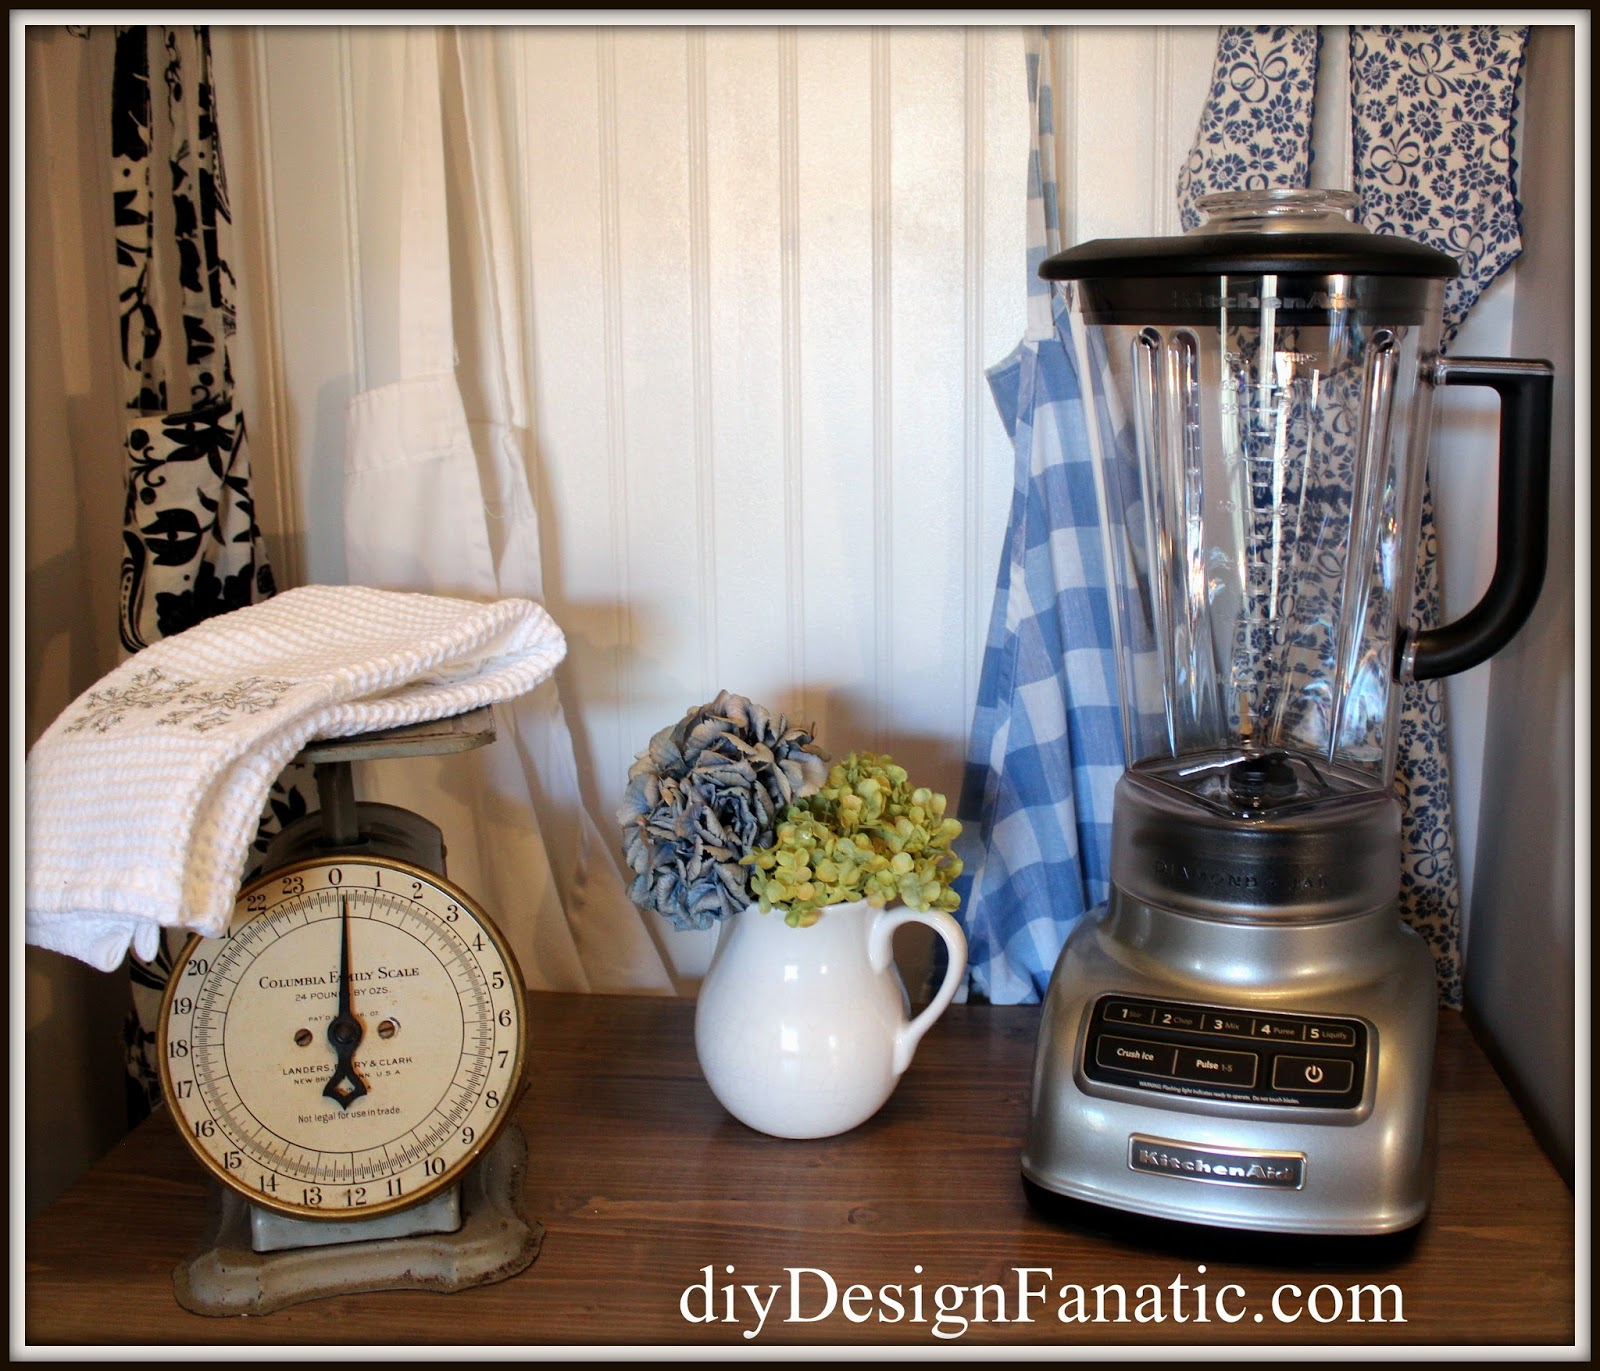 cottage, cottage style, cottage kitchen, kitchen reno, farmhouse, farmhouse style, farmhouse kitchen, Vintage Style Pantry, kitchen cart, reclaimed wood, coat rack, pantry storage